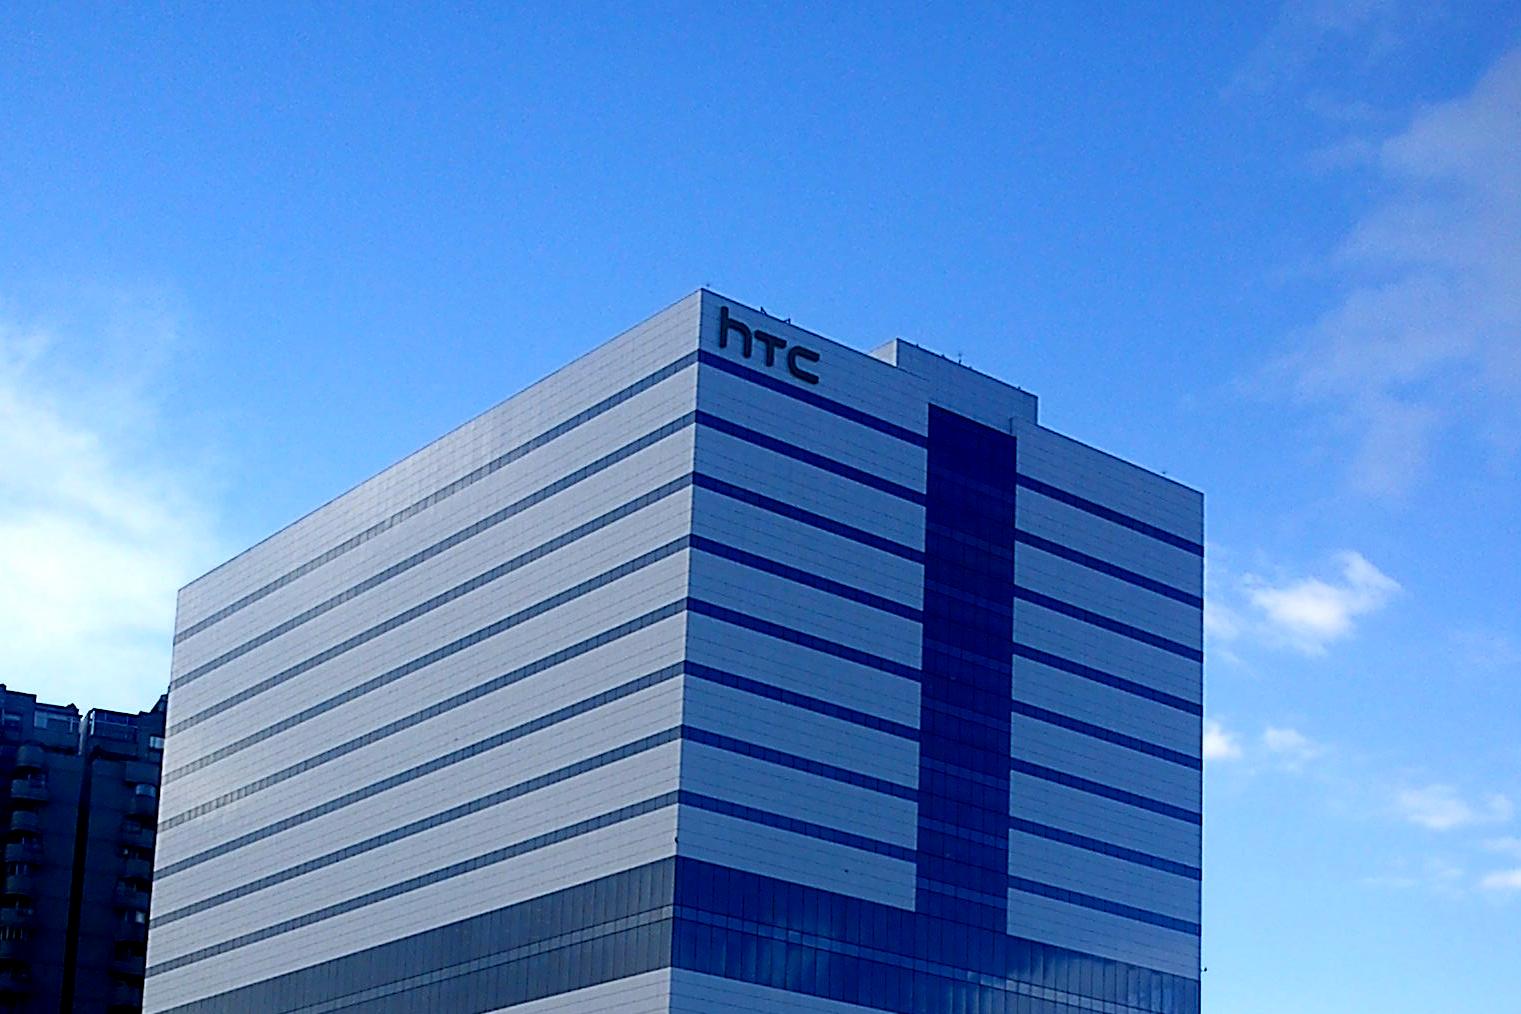 HTC's Q2 preliminary earnings show net loss of $256 million